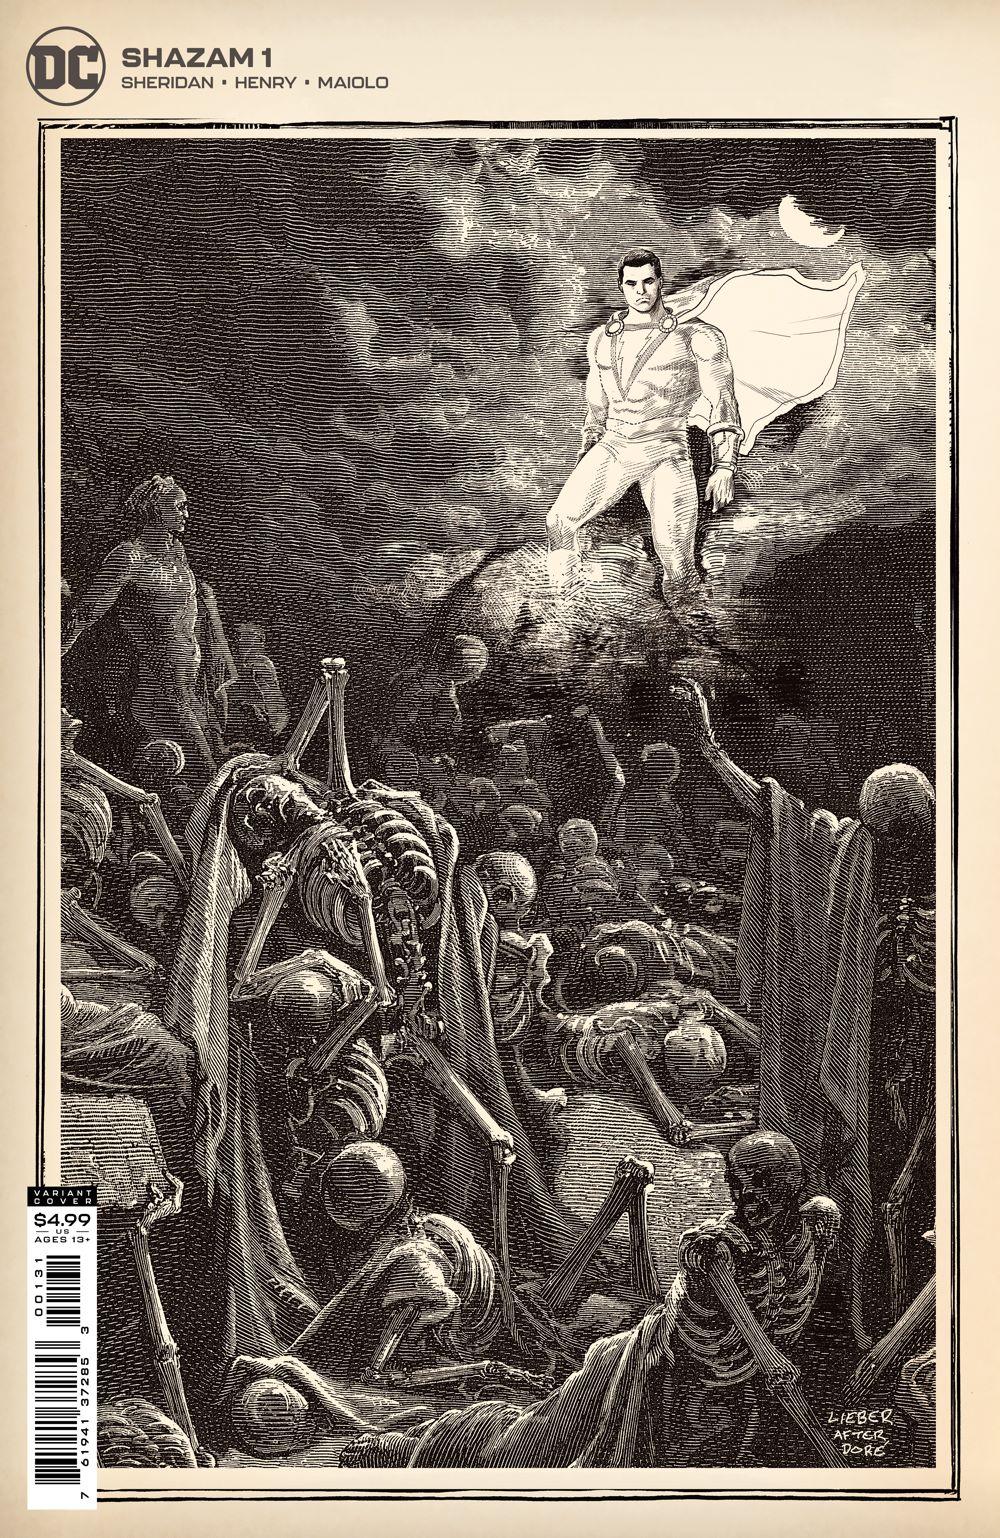 SHAZAM_Cv1_1IN25_var DC Comics July 2021 Solicitations